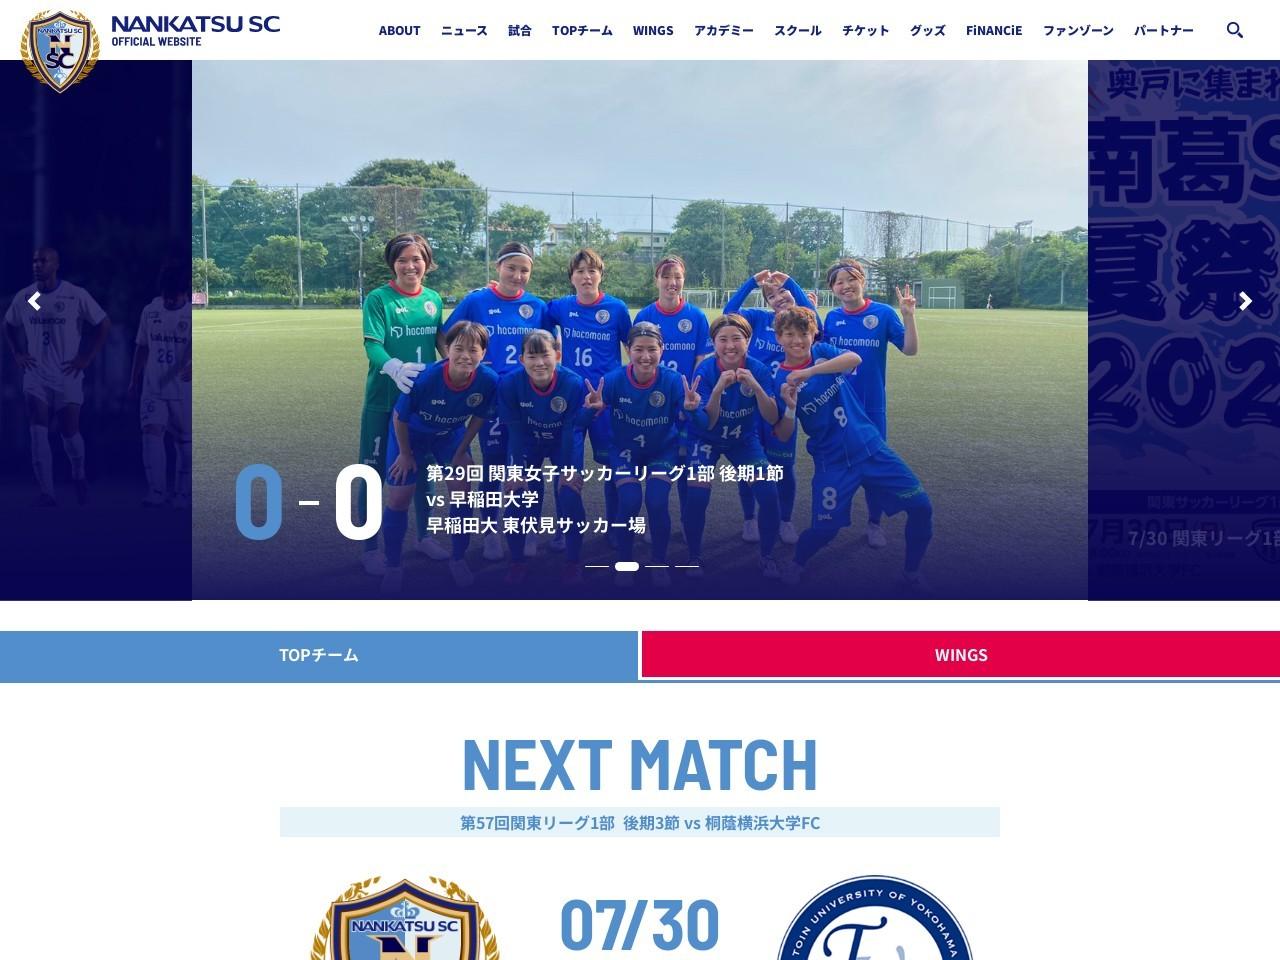 http://www.nankatsu-sc.com/12711.html